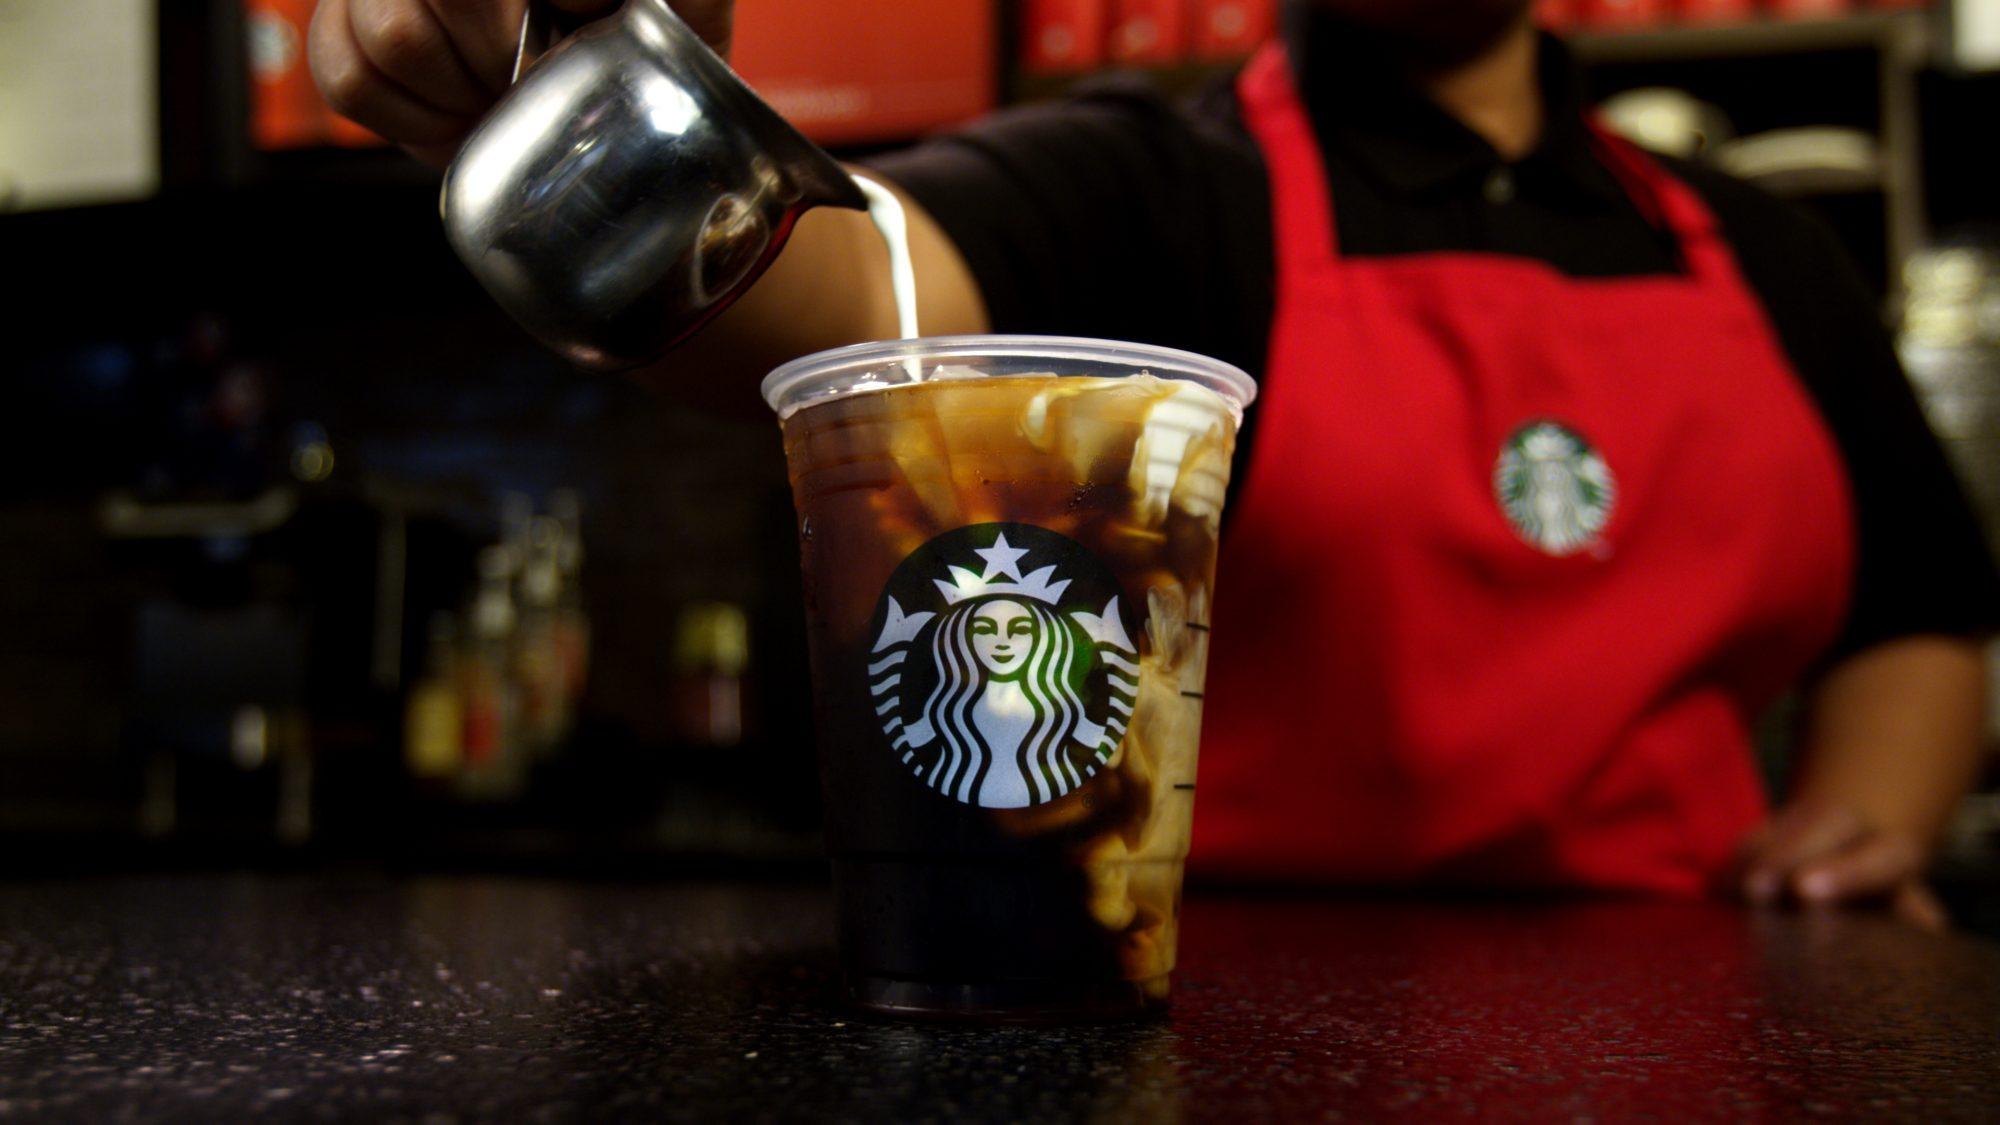 Starbucks_Spiced-Sweet-Cream-NariC3B1o-70-Cold-Brew_1.jpg